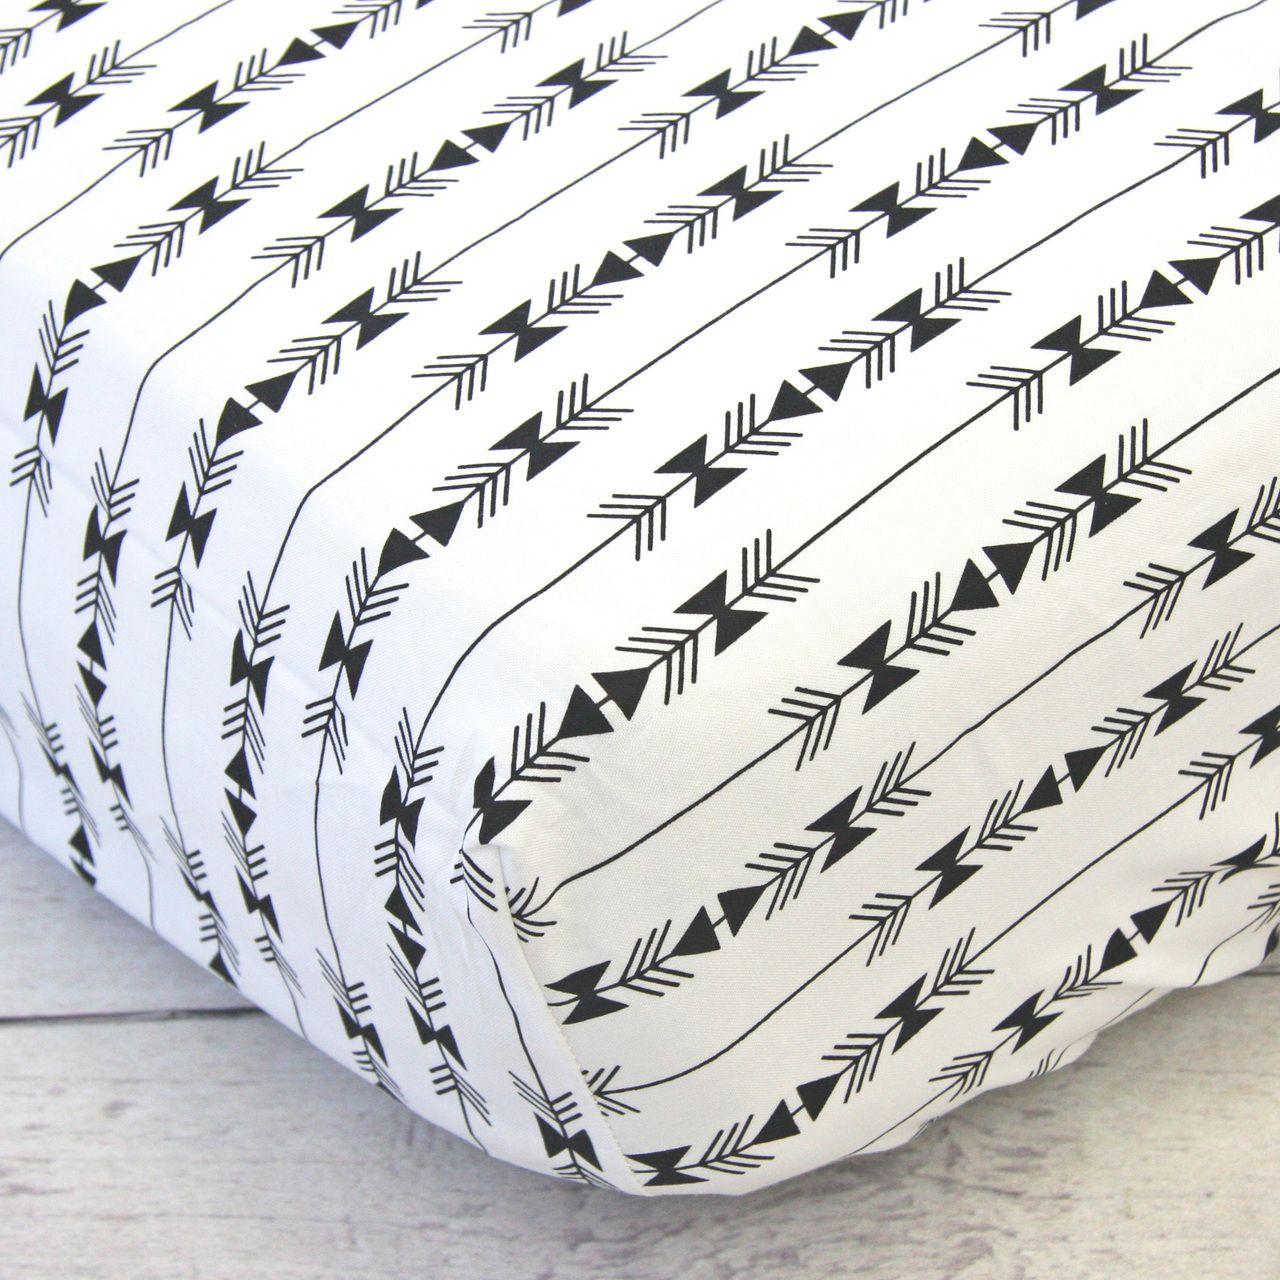 Crib Sheet Black White Arrow Aztec Crib Sheets Aztec Nursery Black And White Arrow Black and white pattern sheets